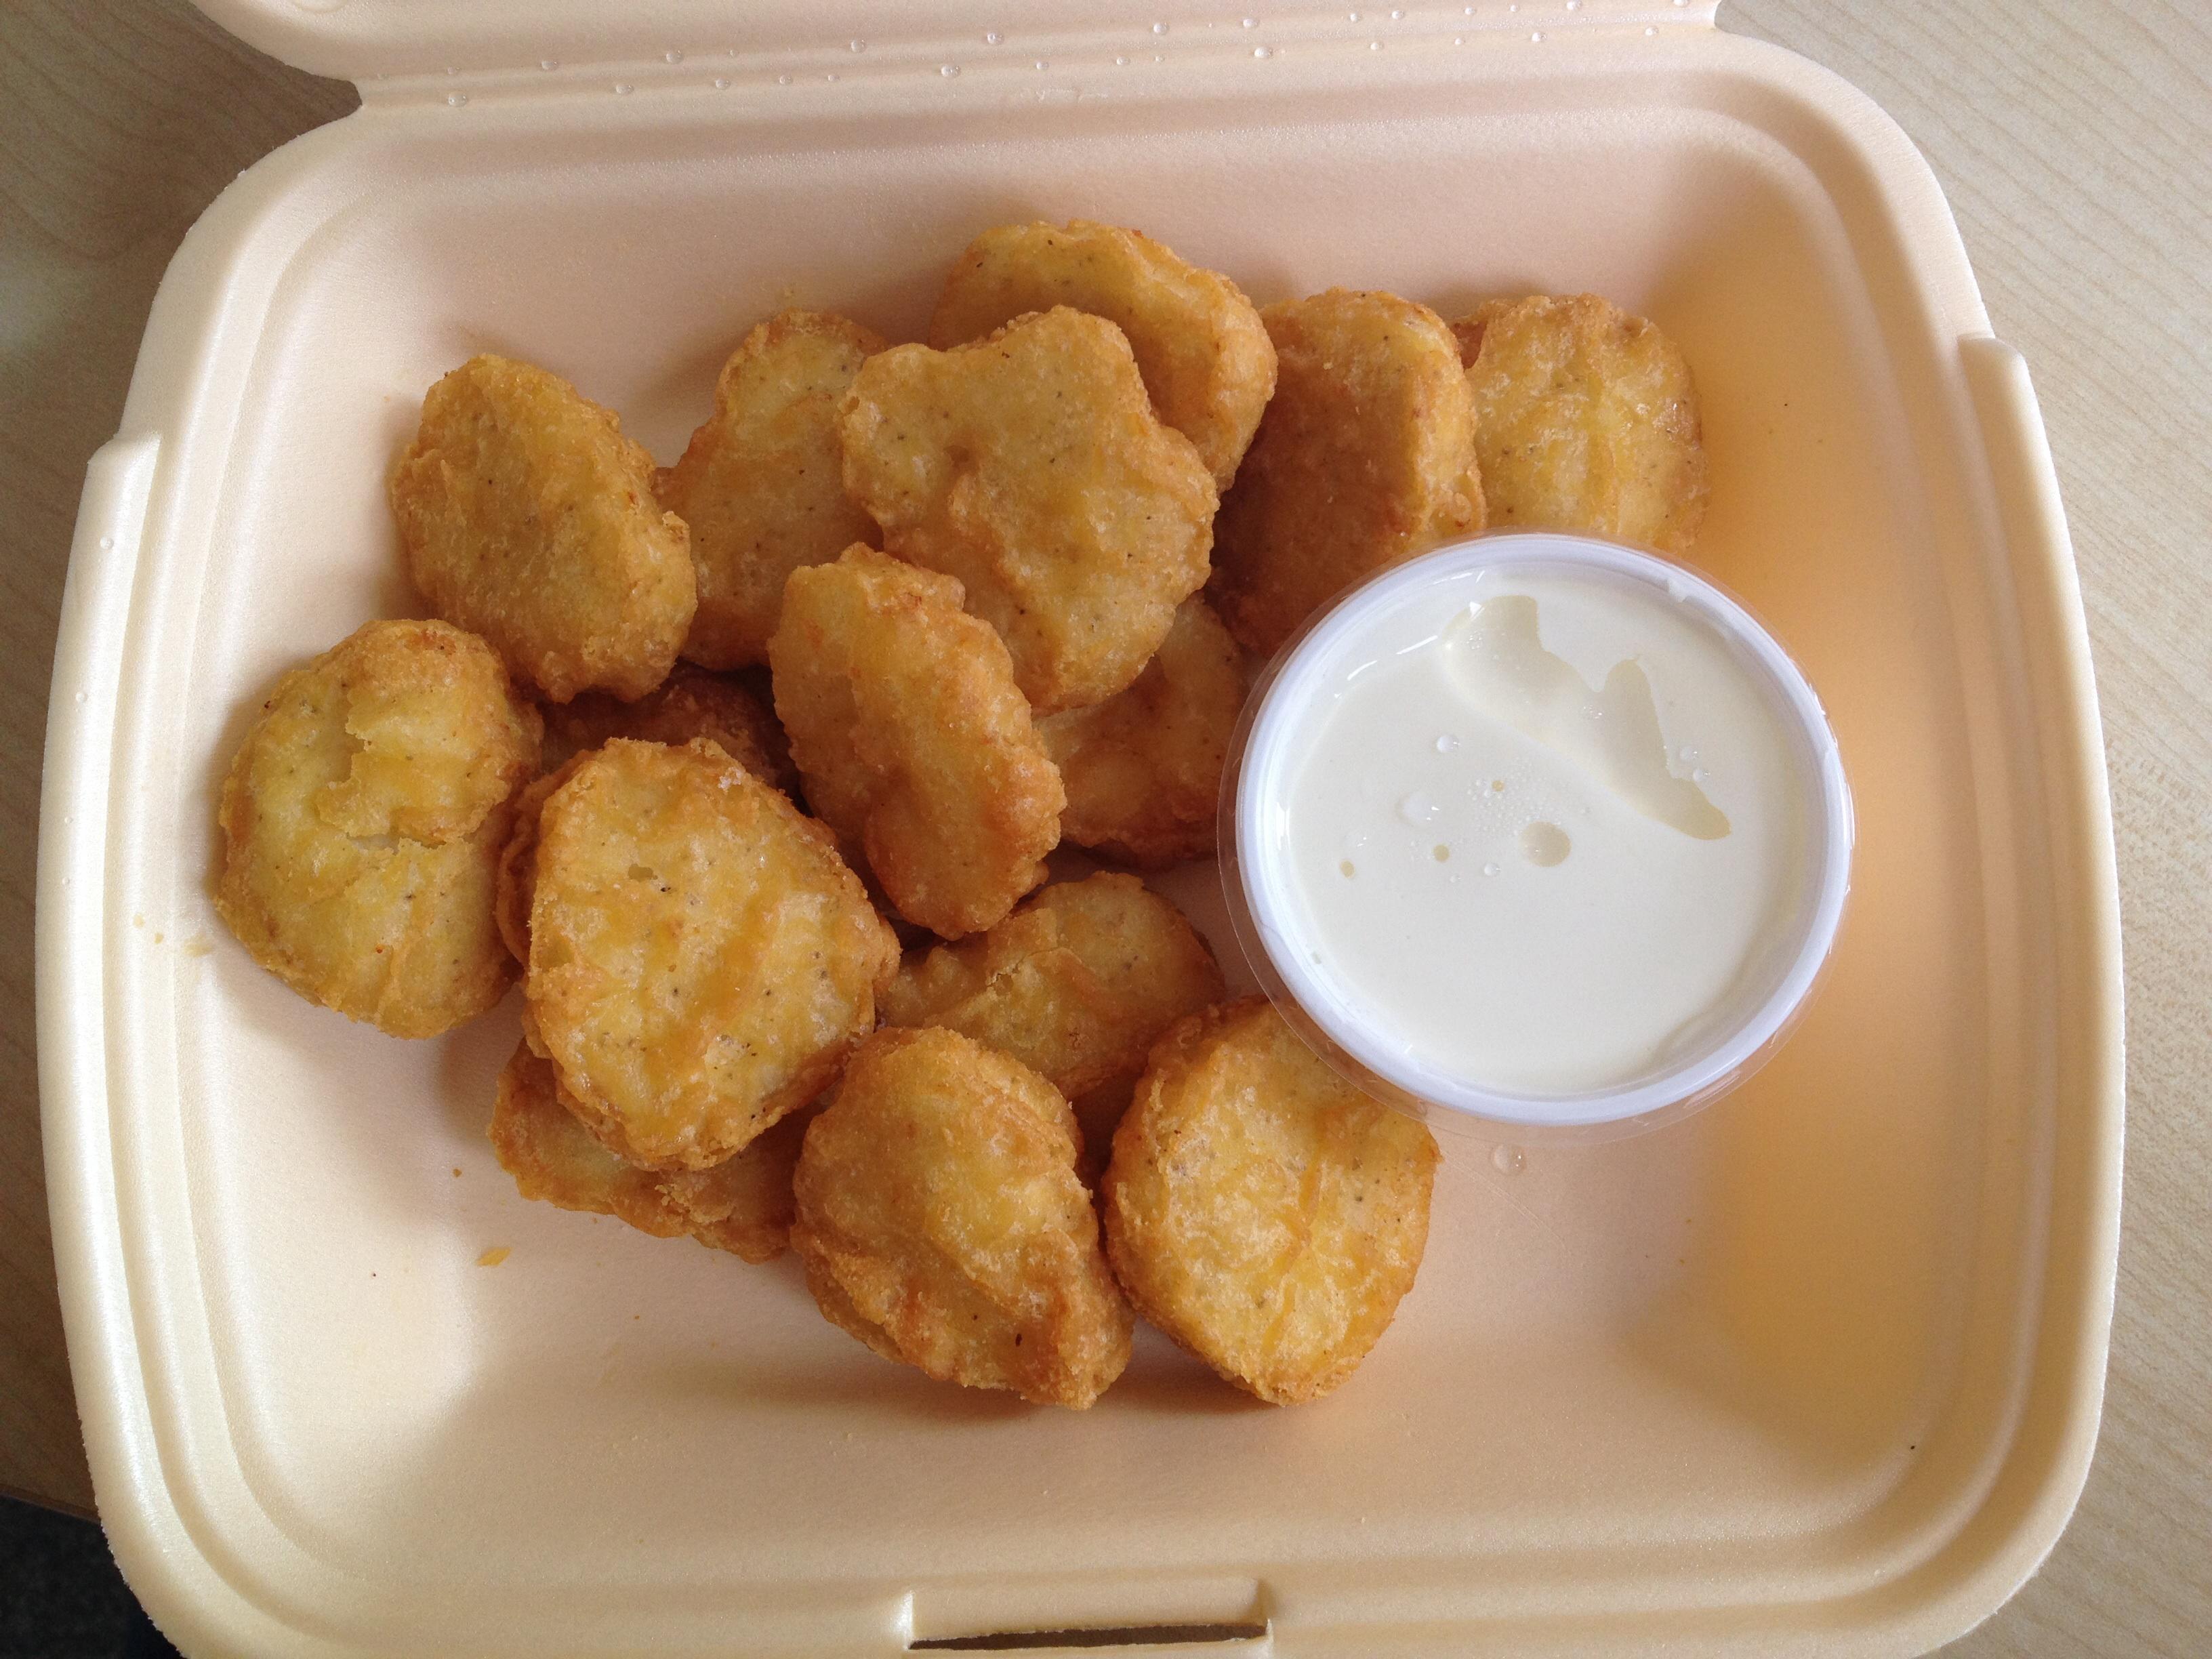 https://foodloader.net/BrollyLSSJ_2014-09-05_Liberty_s_Drinks_&_Food_-_15_Chicken_Nuggets___Crema_Fresca_Dip.jpg